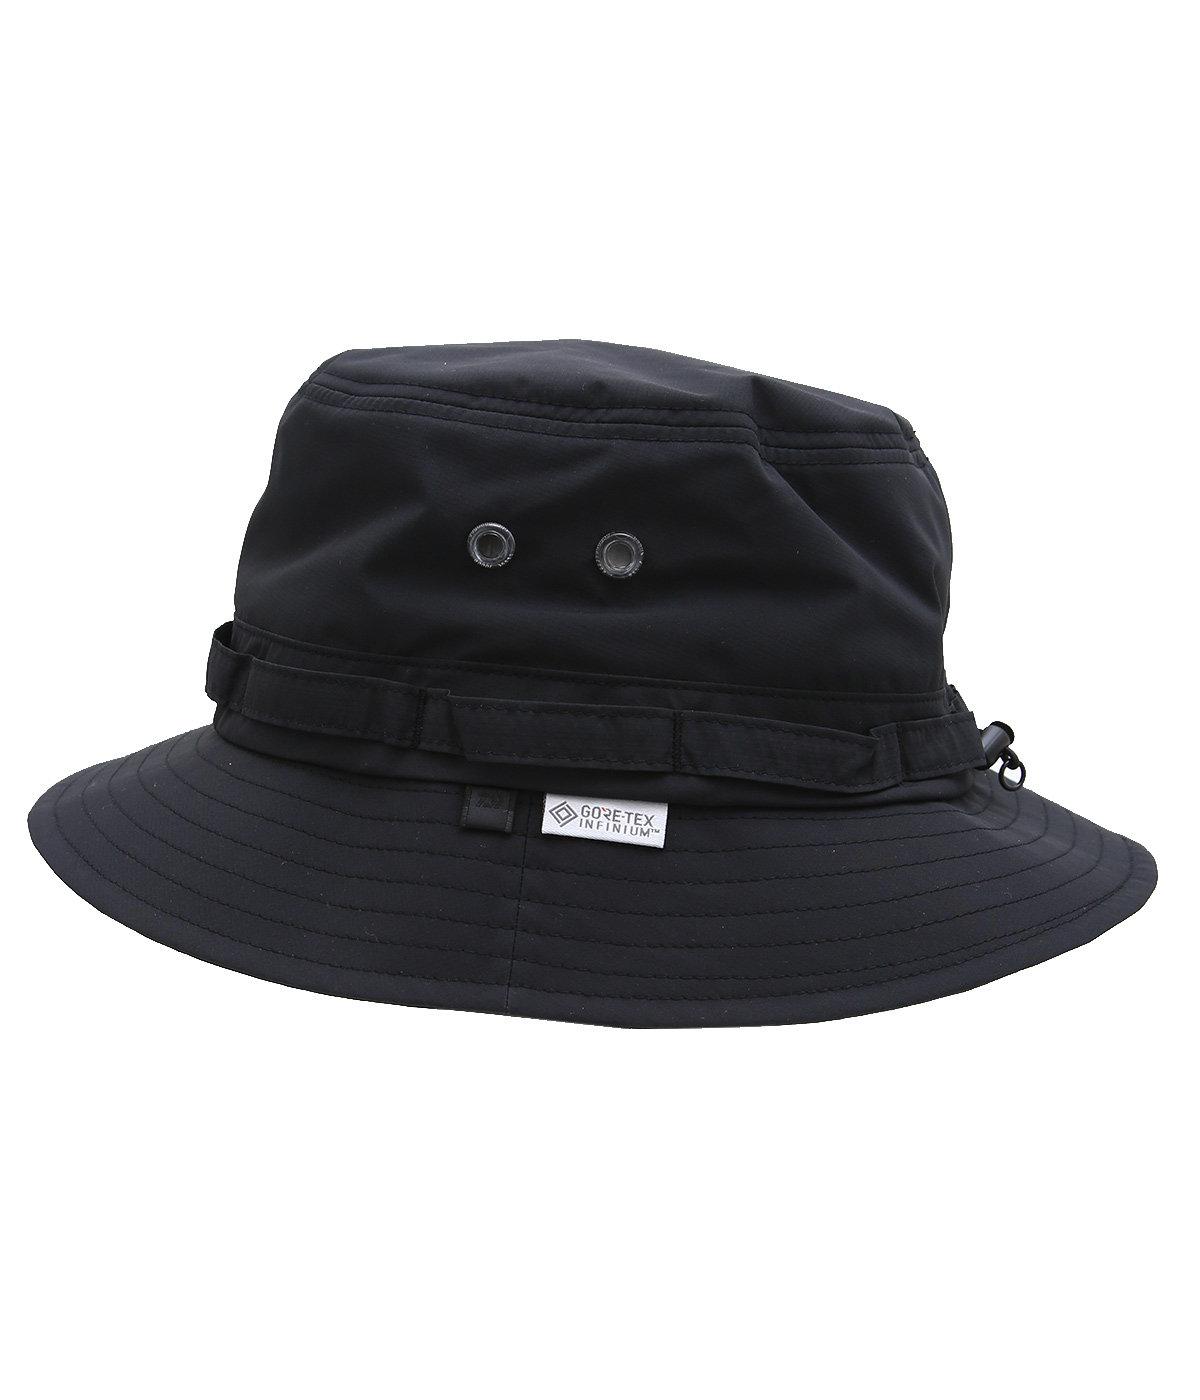 GORE-TEX INFINIUM Tech Jungle Hat